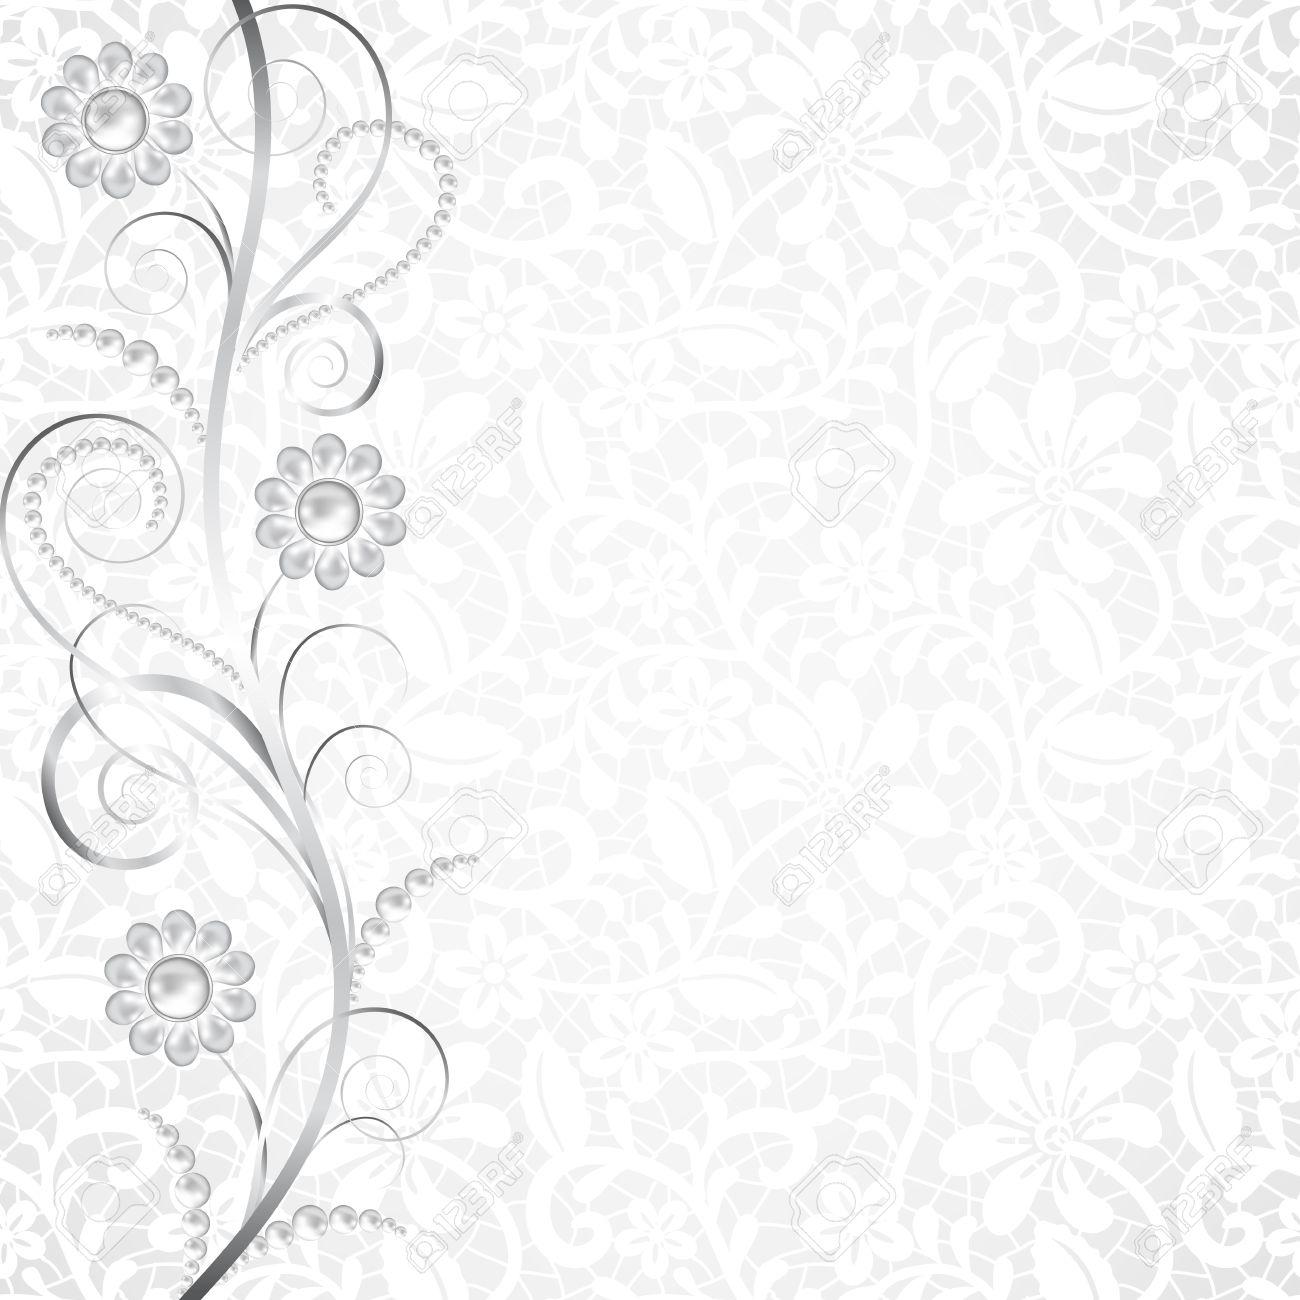 background for invitation